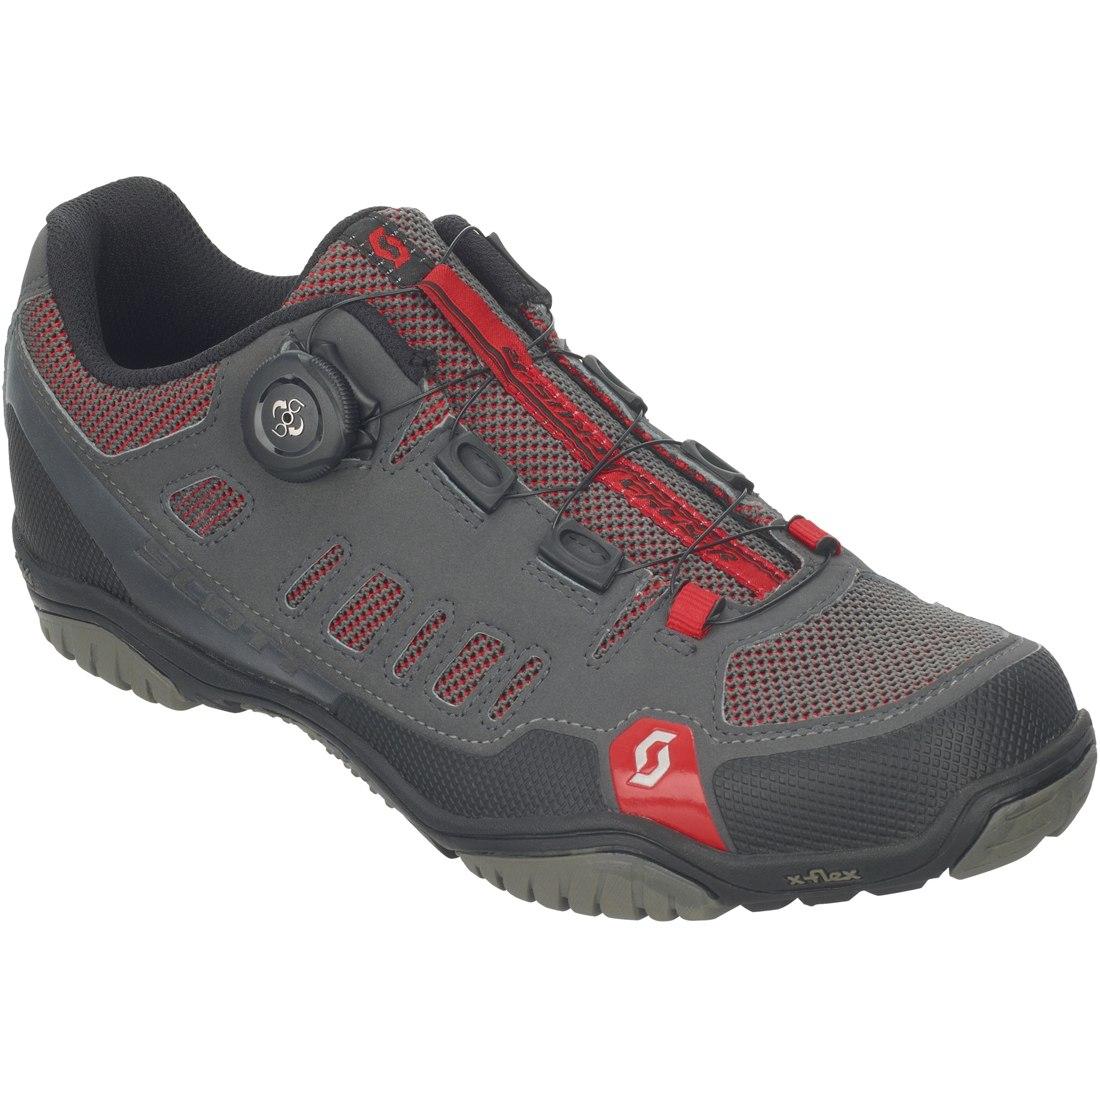 SCOTT Sport Crus-r BOA Schuh - anthracite/red